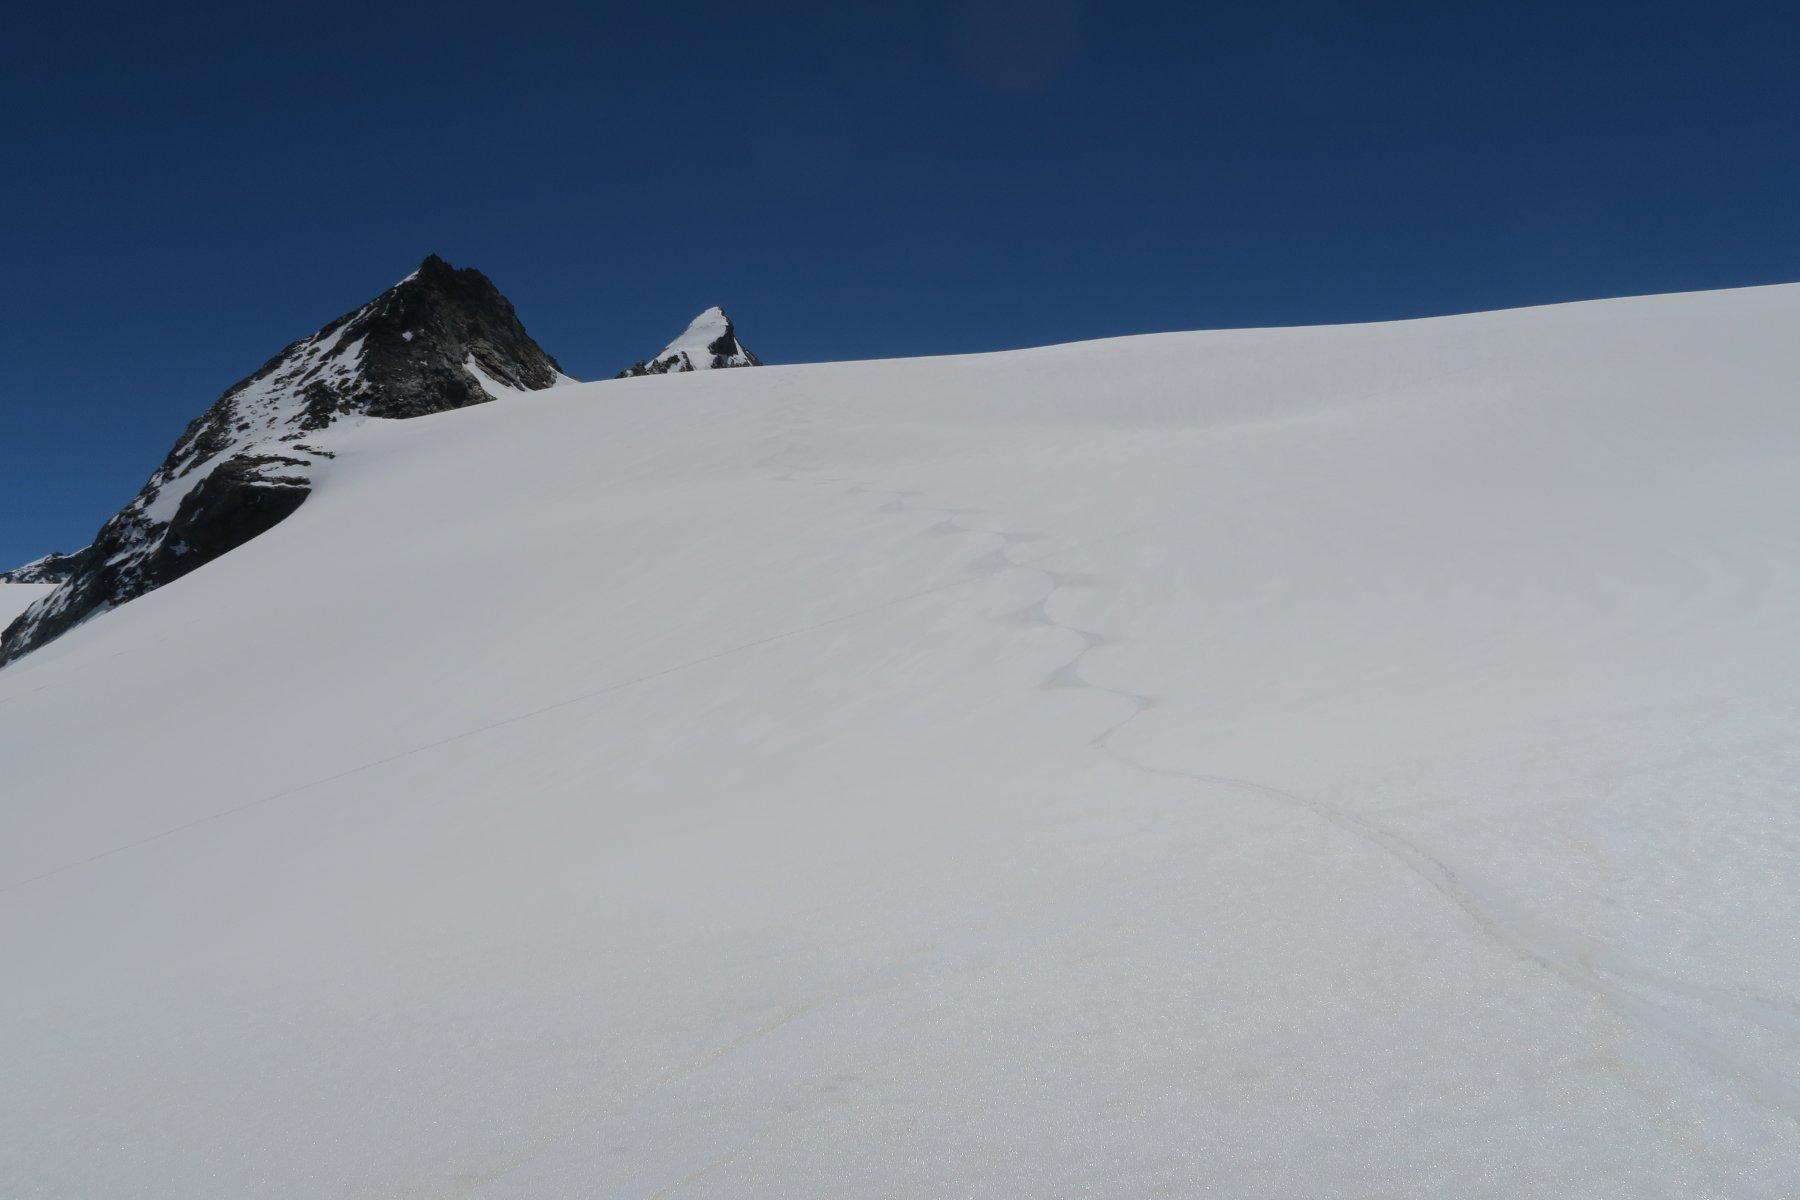 neve fantastica sul ghiacciaio